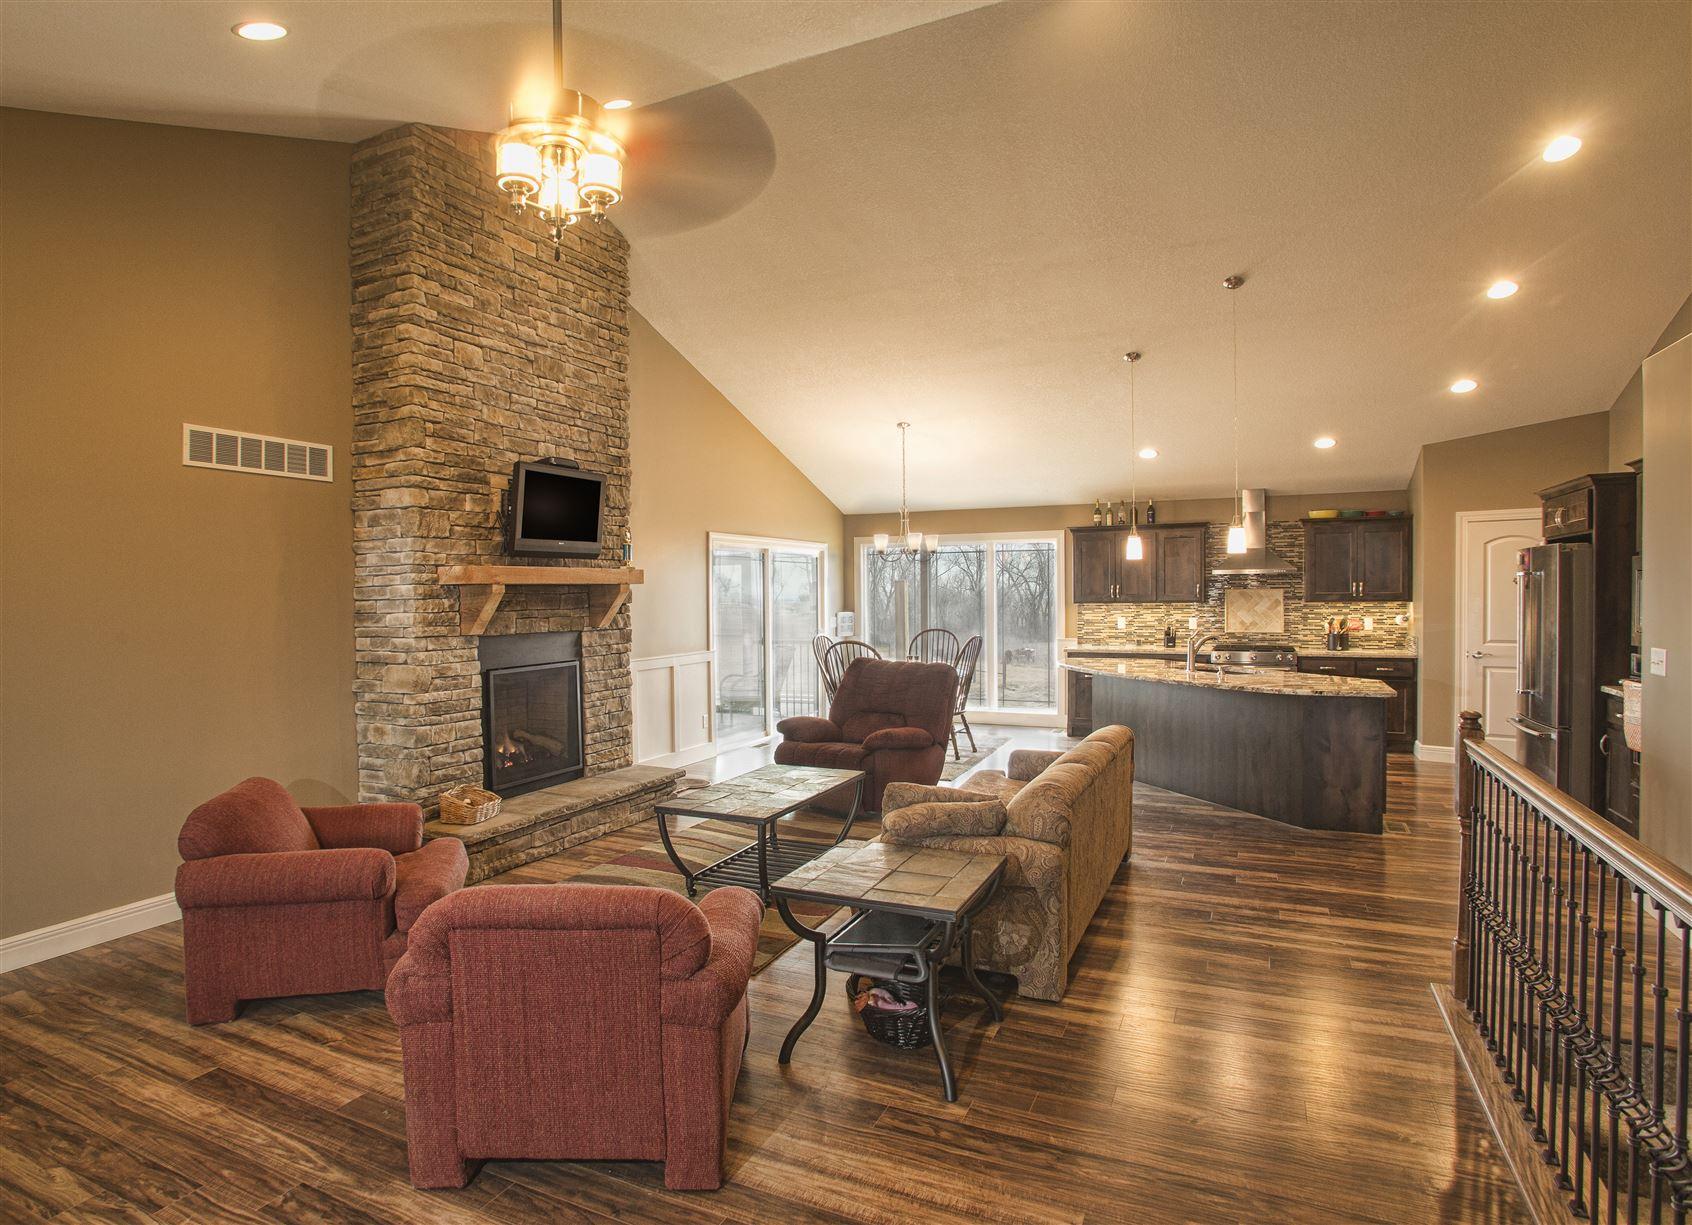 Keatyley Living room_resized